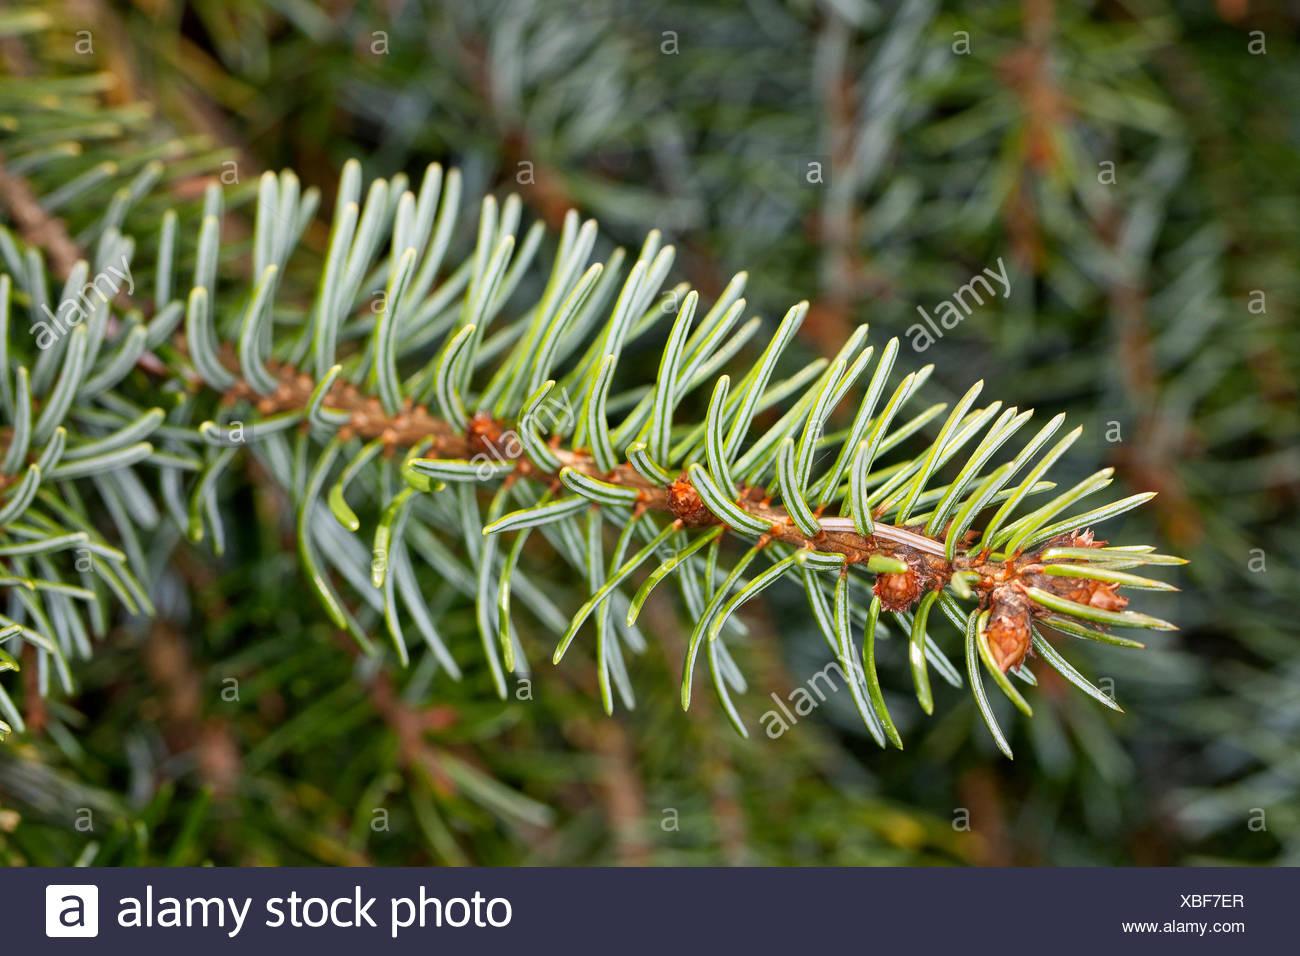 Serbian Spruce (Picea omorika), branch - Stock Image